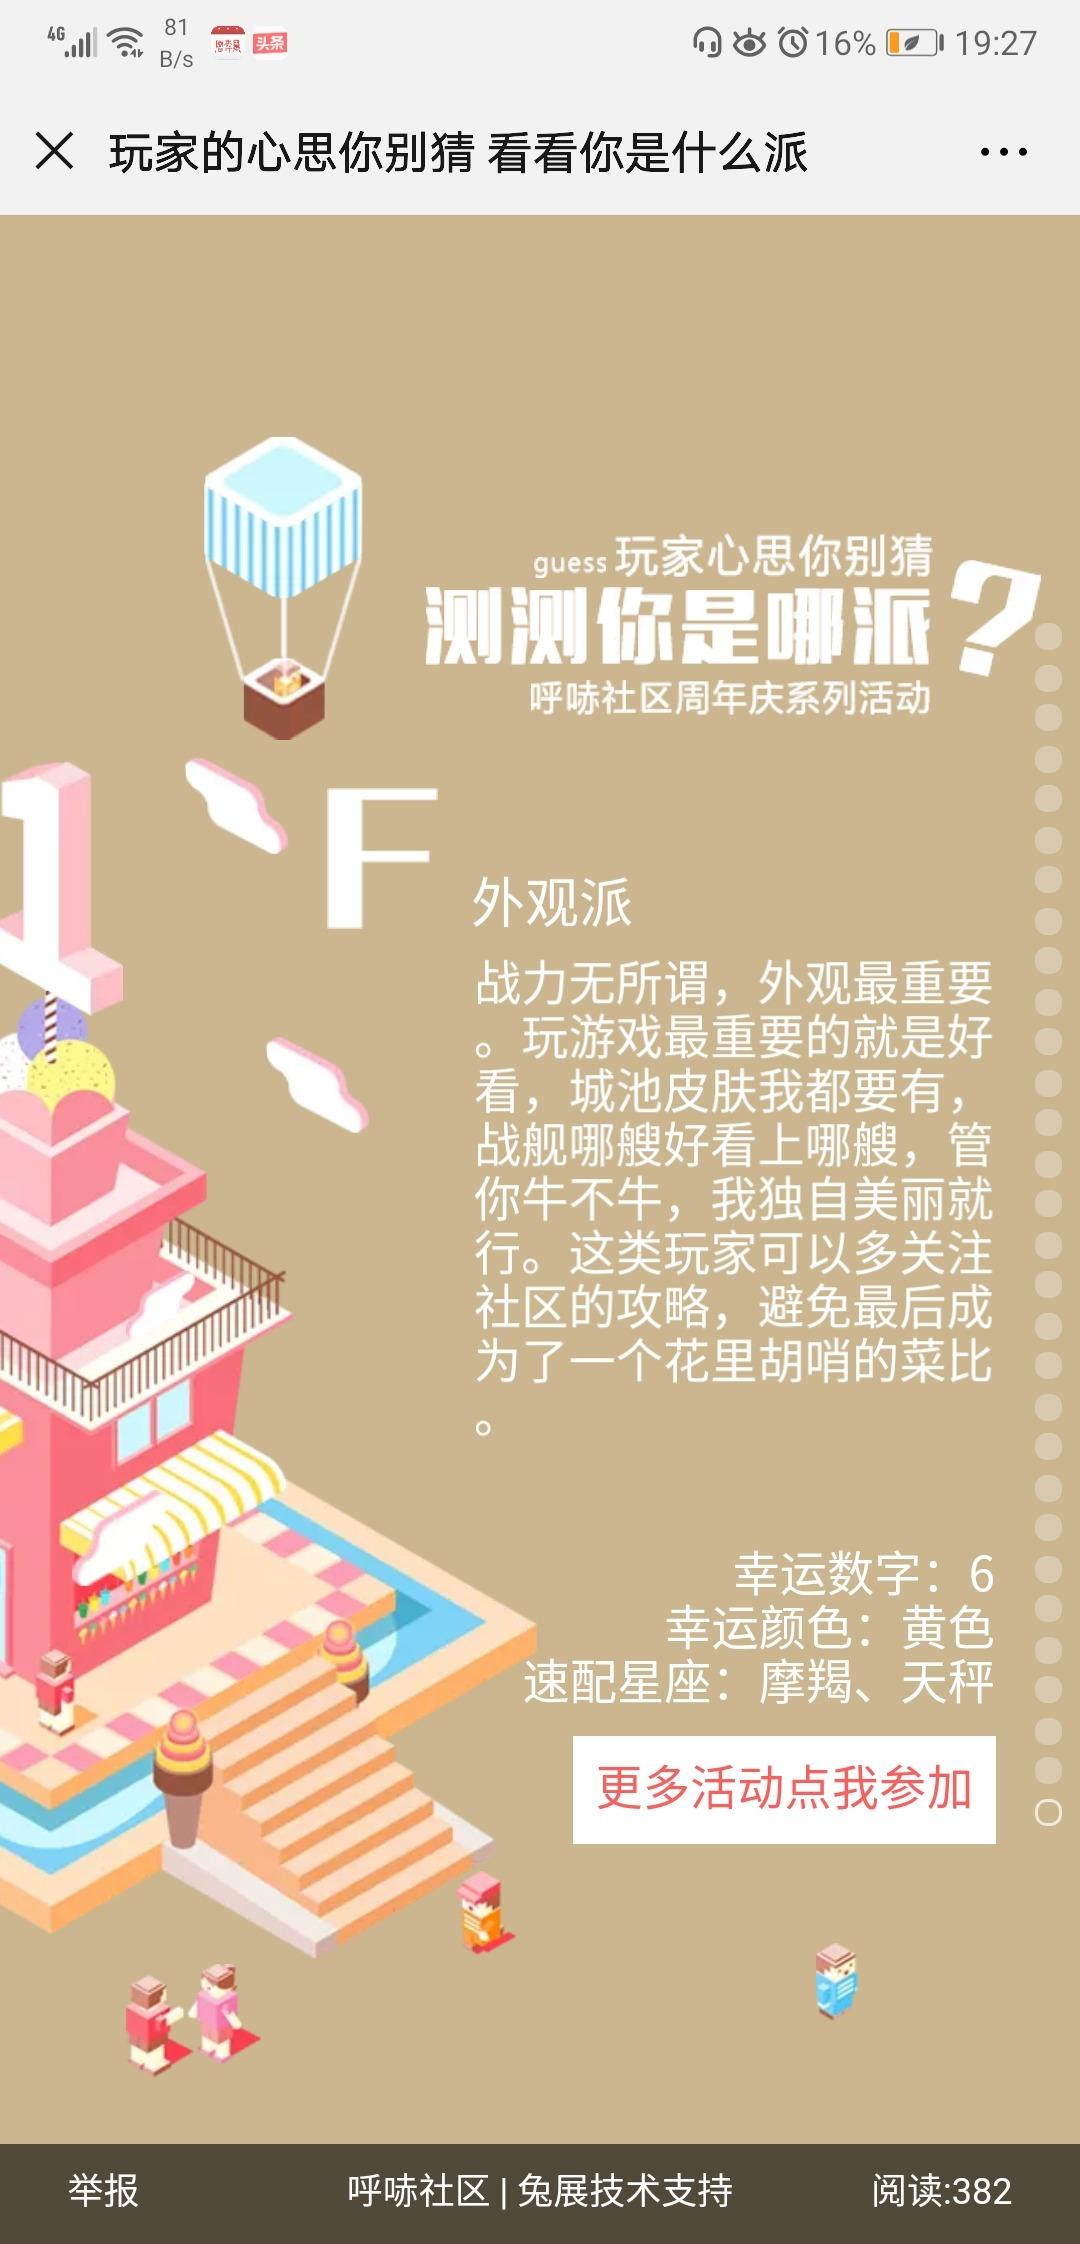 Screenshot_20190725_192702_com.tencent.mm.jpg